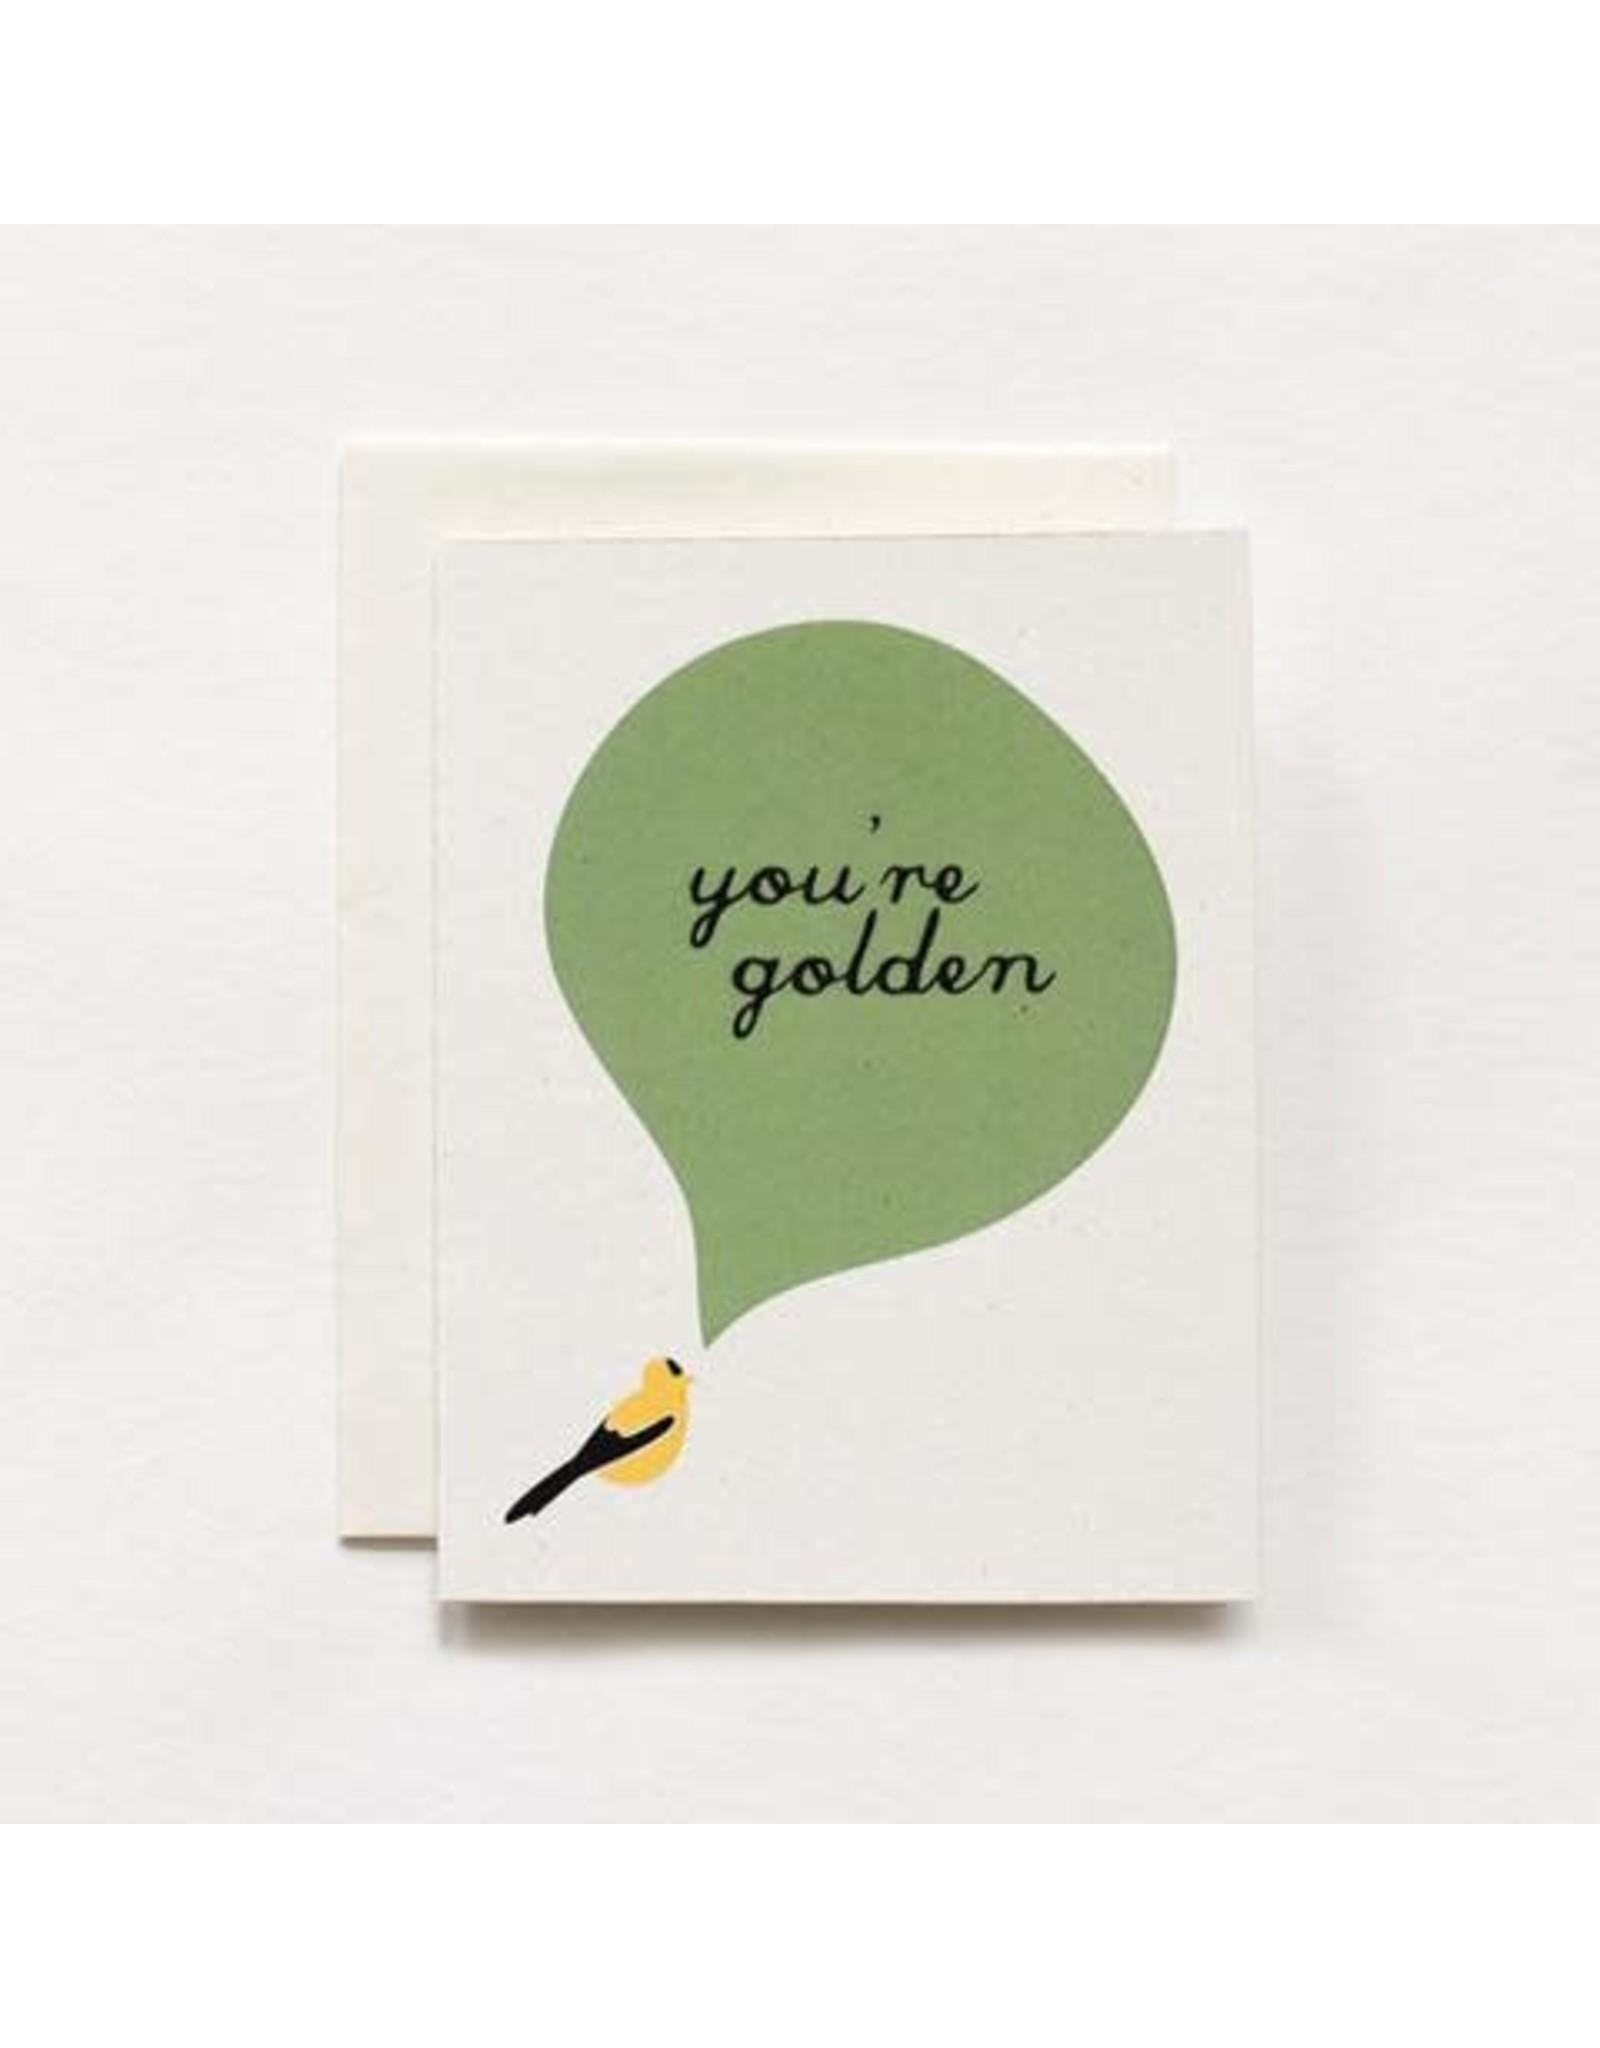 June & December Greeting Card - you're golden